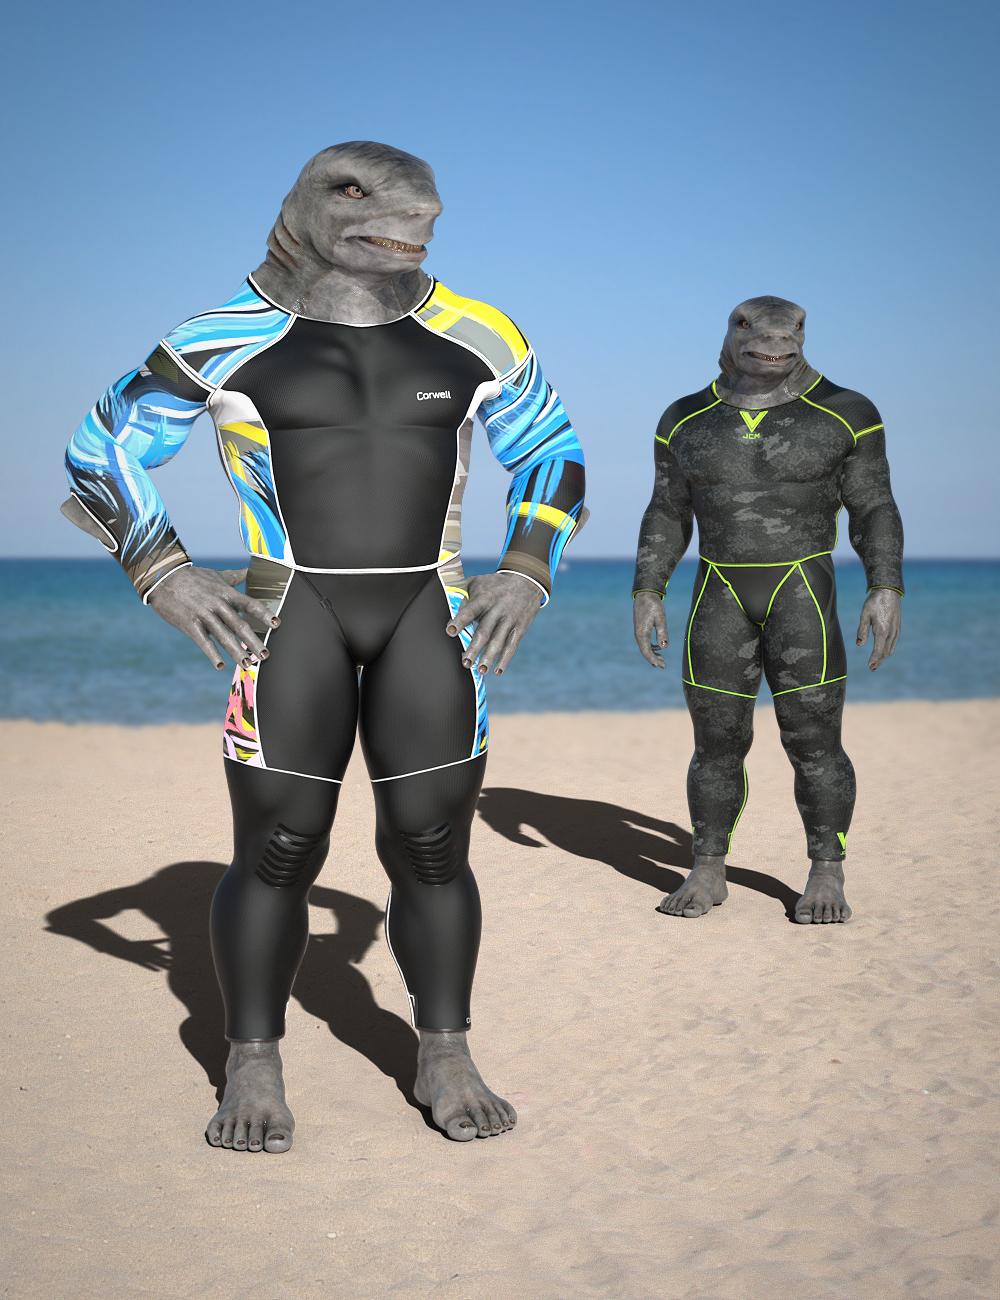 Bodysuit for Jawz Alternate Textures by: RedCrow3DArtOdyssey, 3D Models by Daz 3D